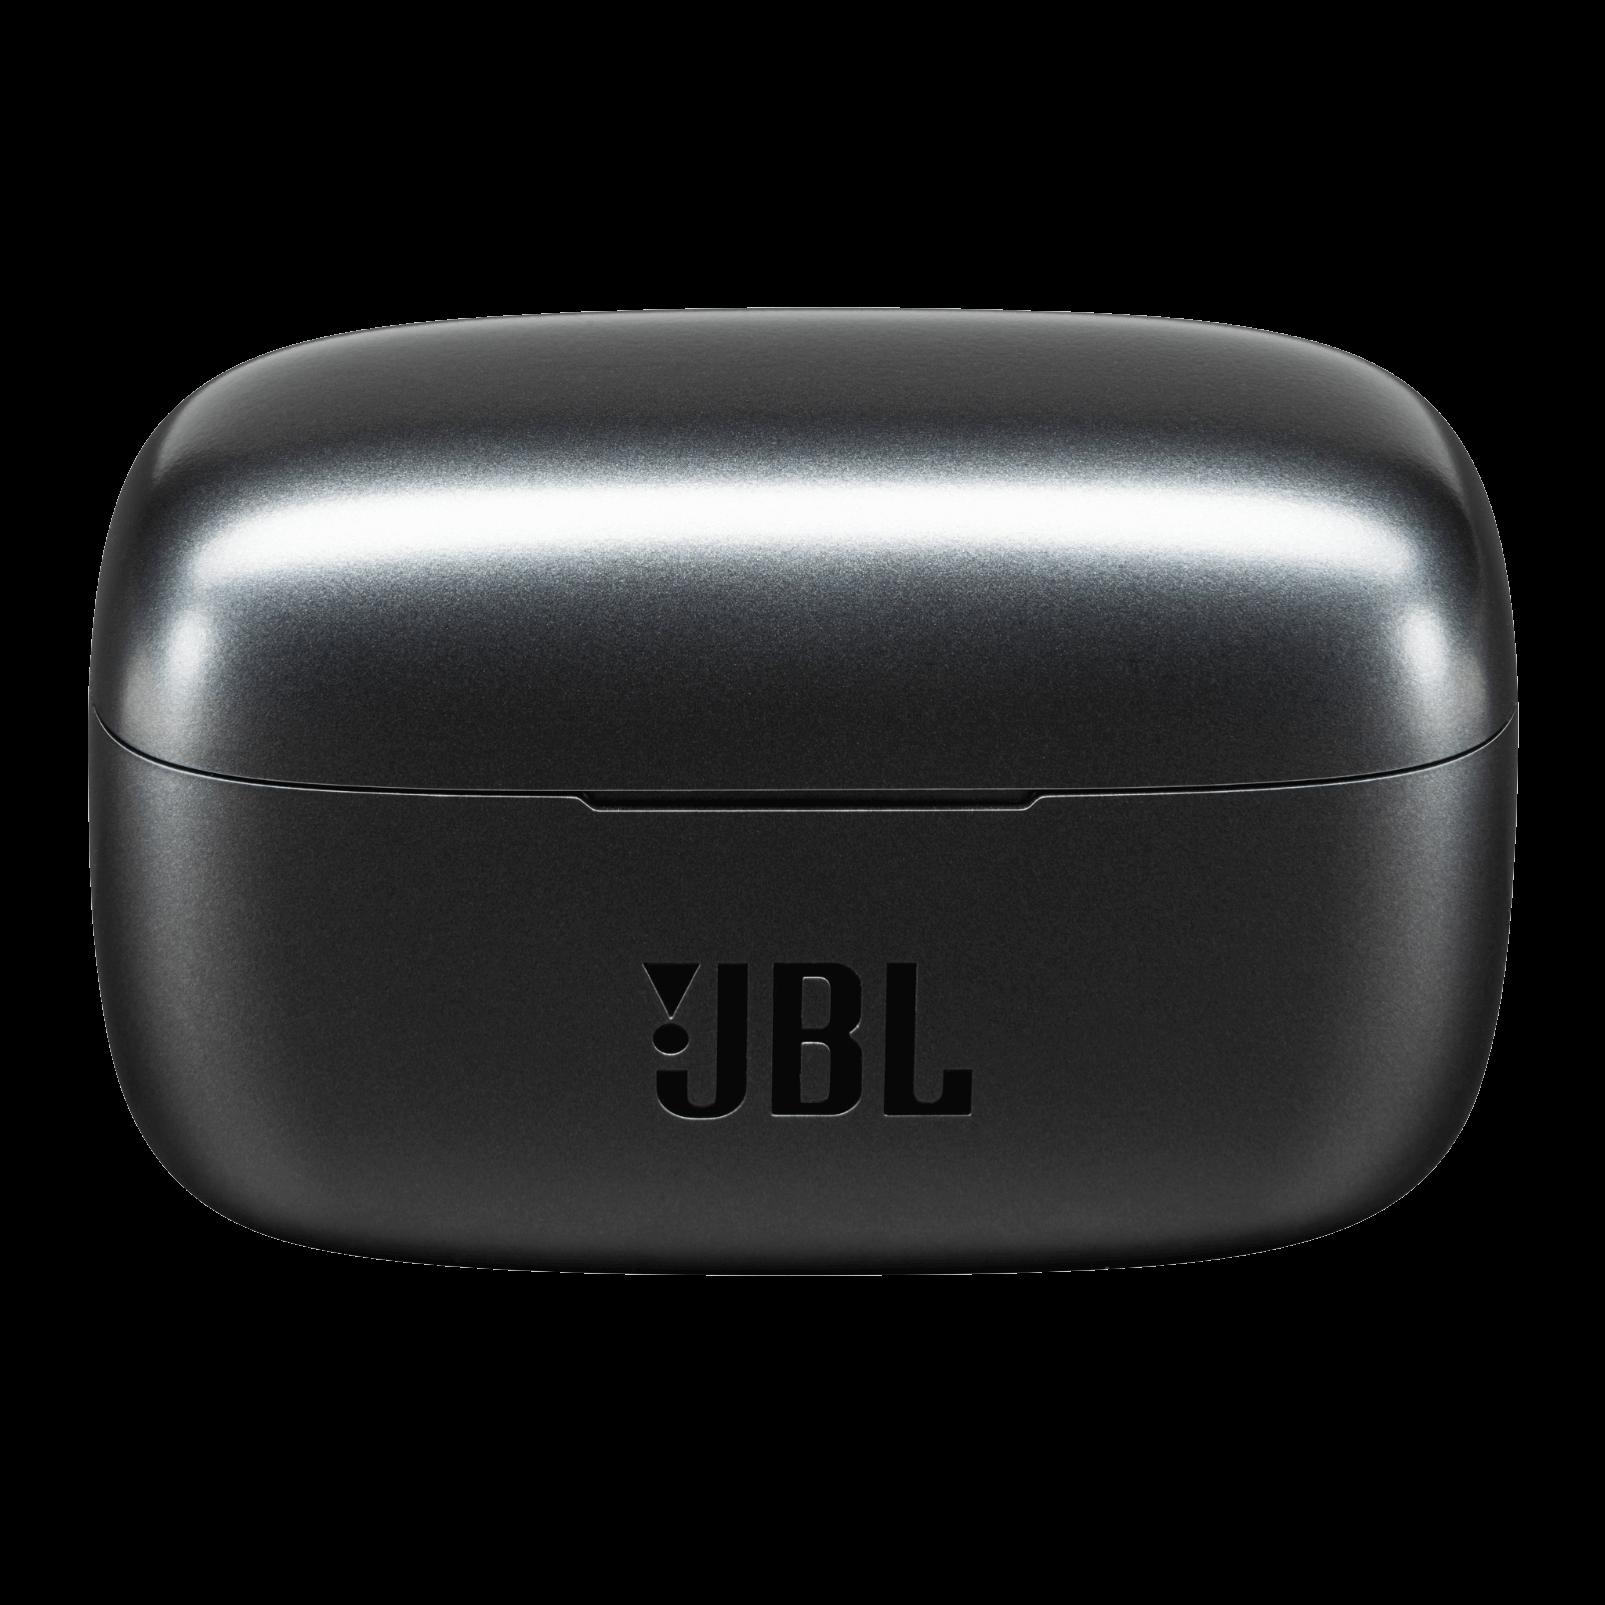 JBL LIVE 300TWS - Black - True wireless in-ear headphones with Smart Ambient - Detailshot 4